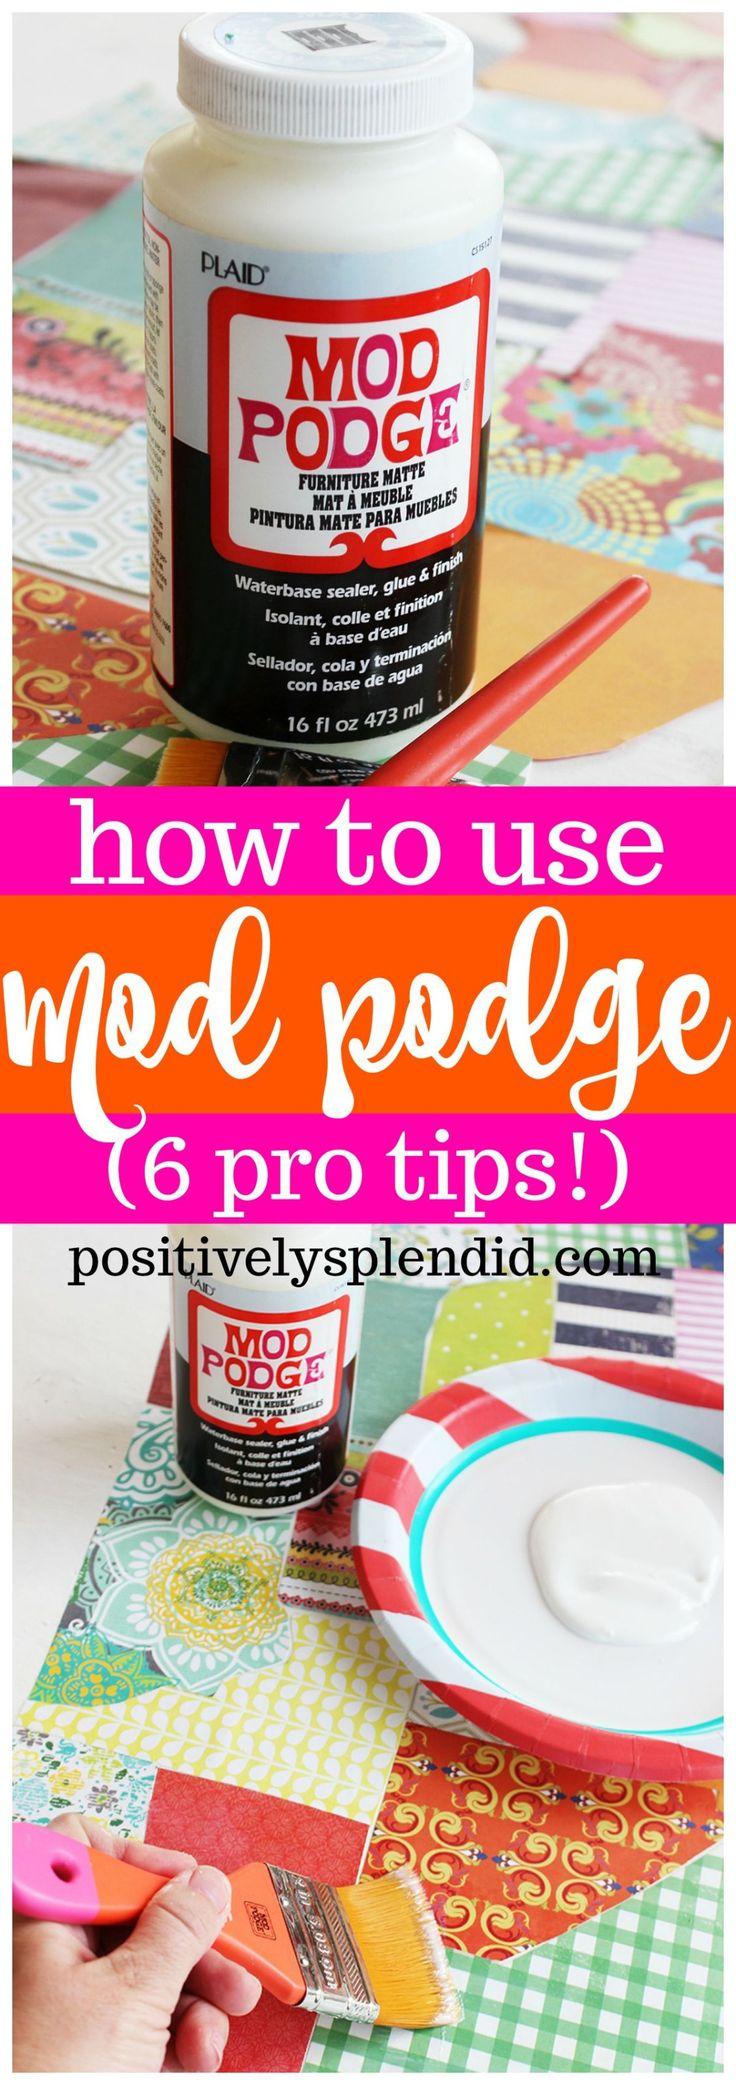 How to Use Mod Podge LIke a Pro - 6 Great Tips!